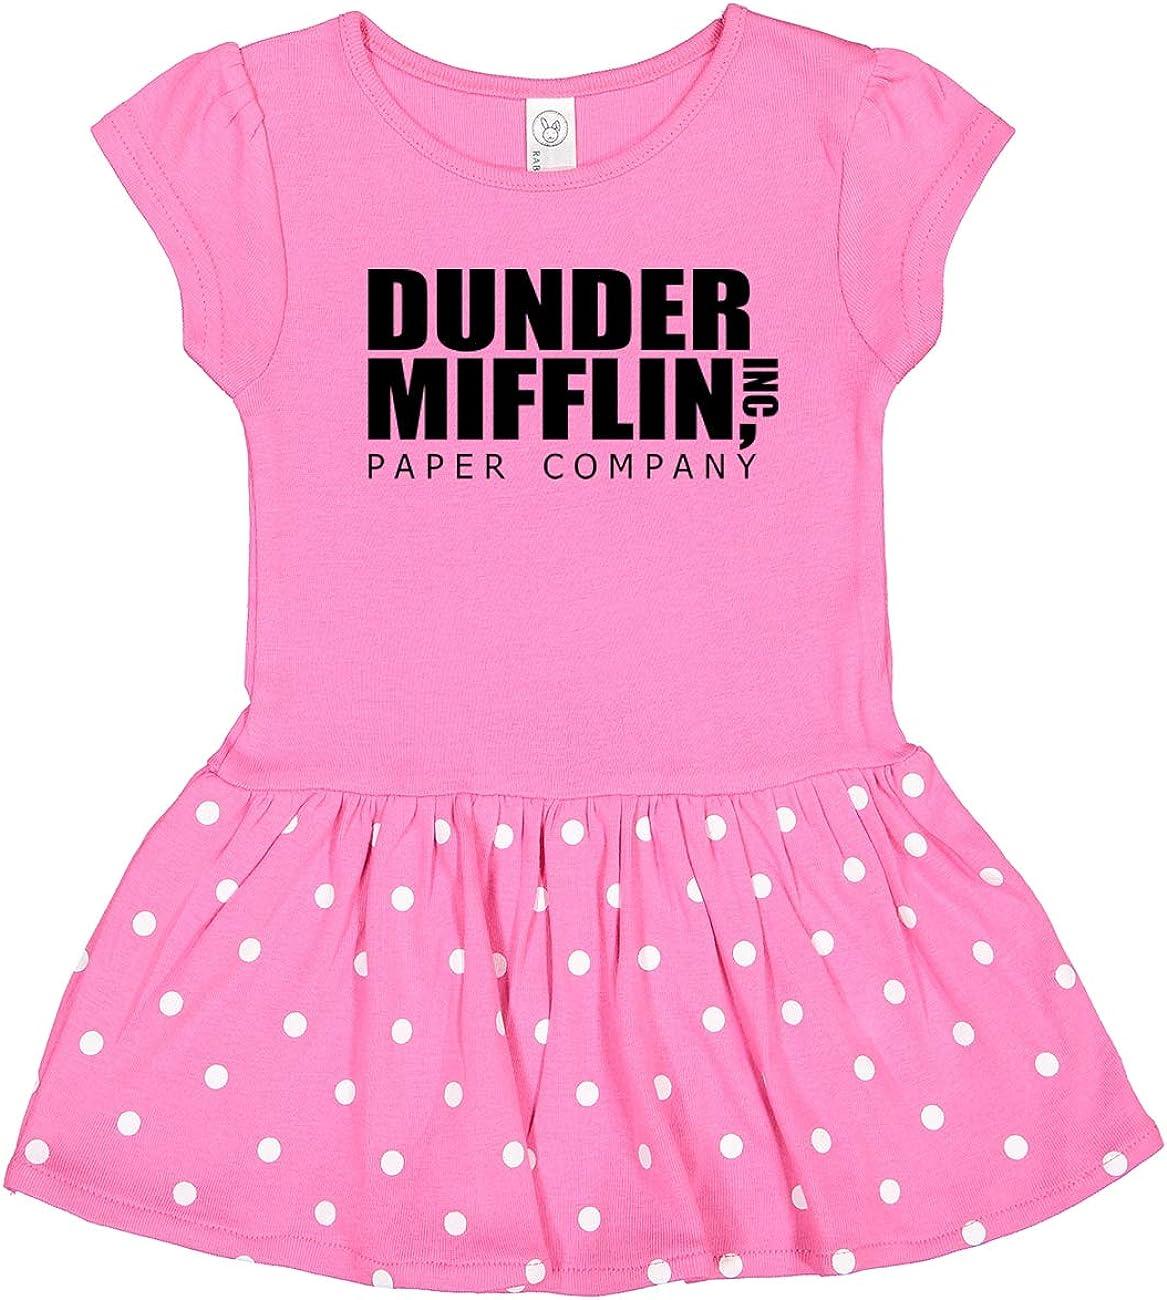 NorthStarTees The Office Dunder Mifflin Baby Rib Dress Onesie